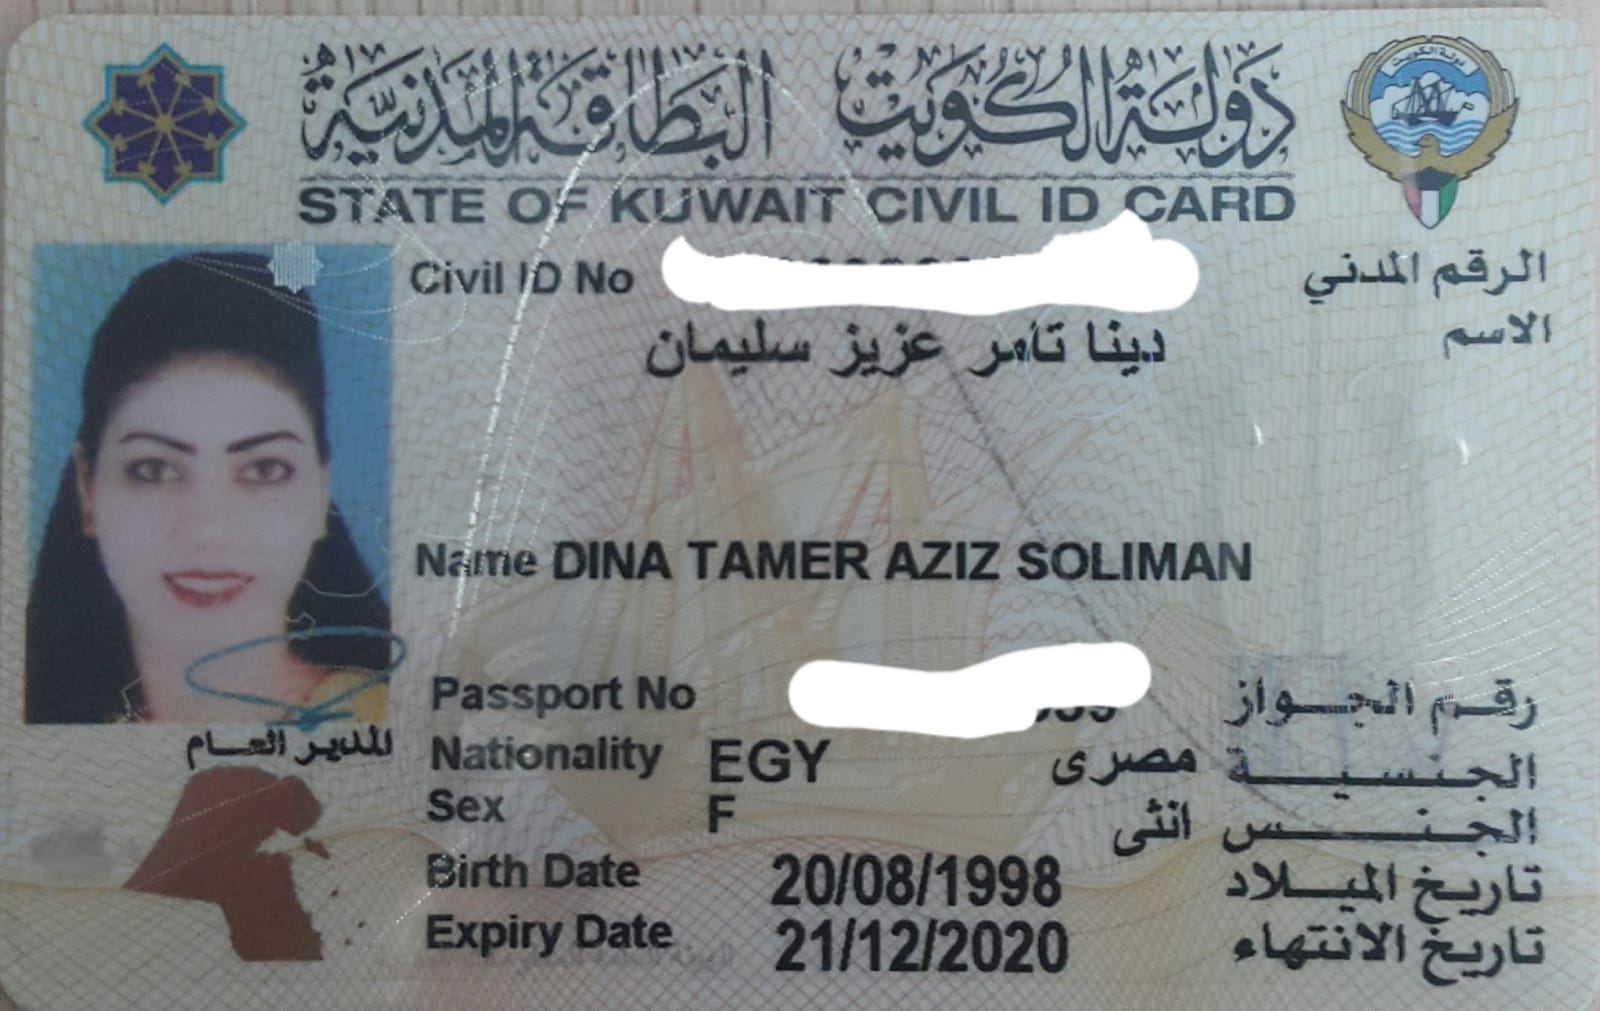 Samsung Mobile and civil id